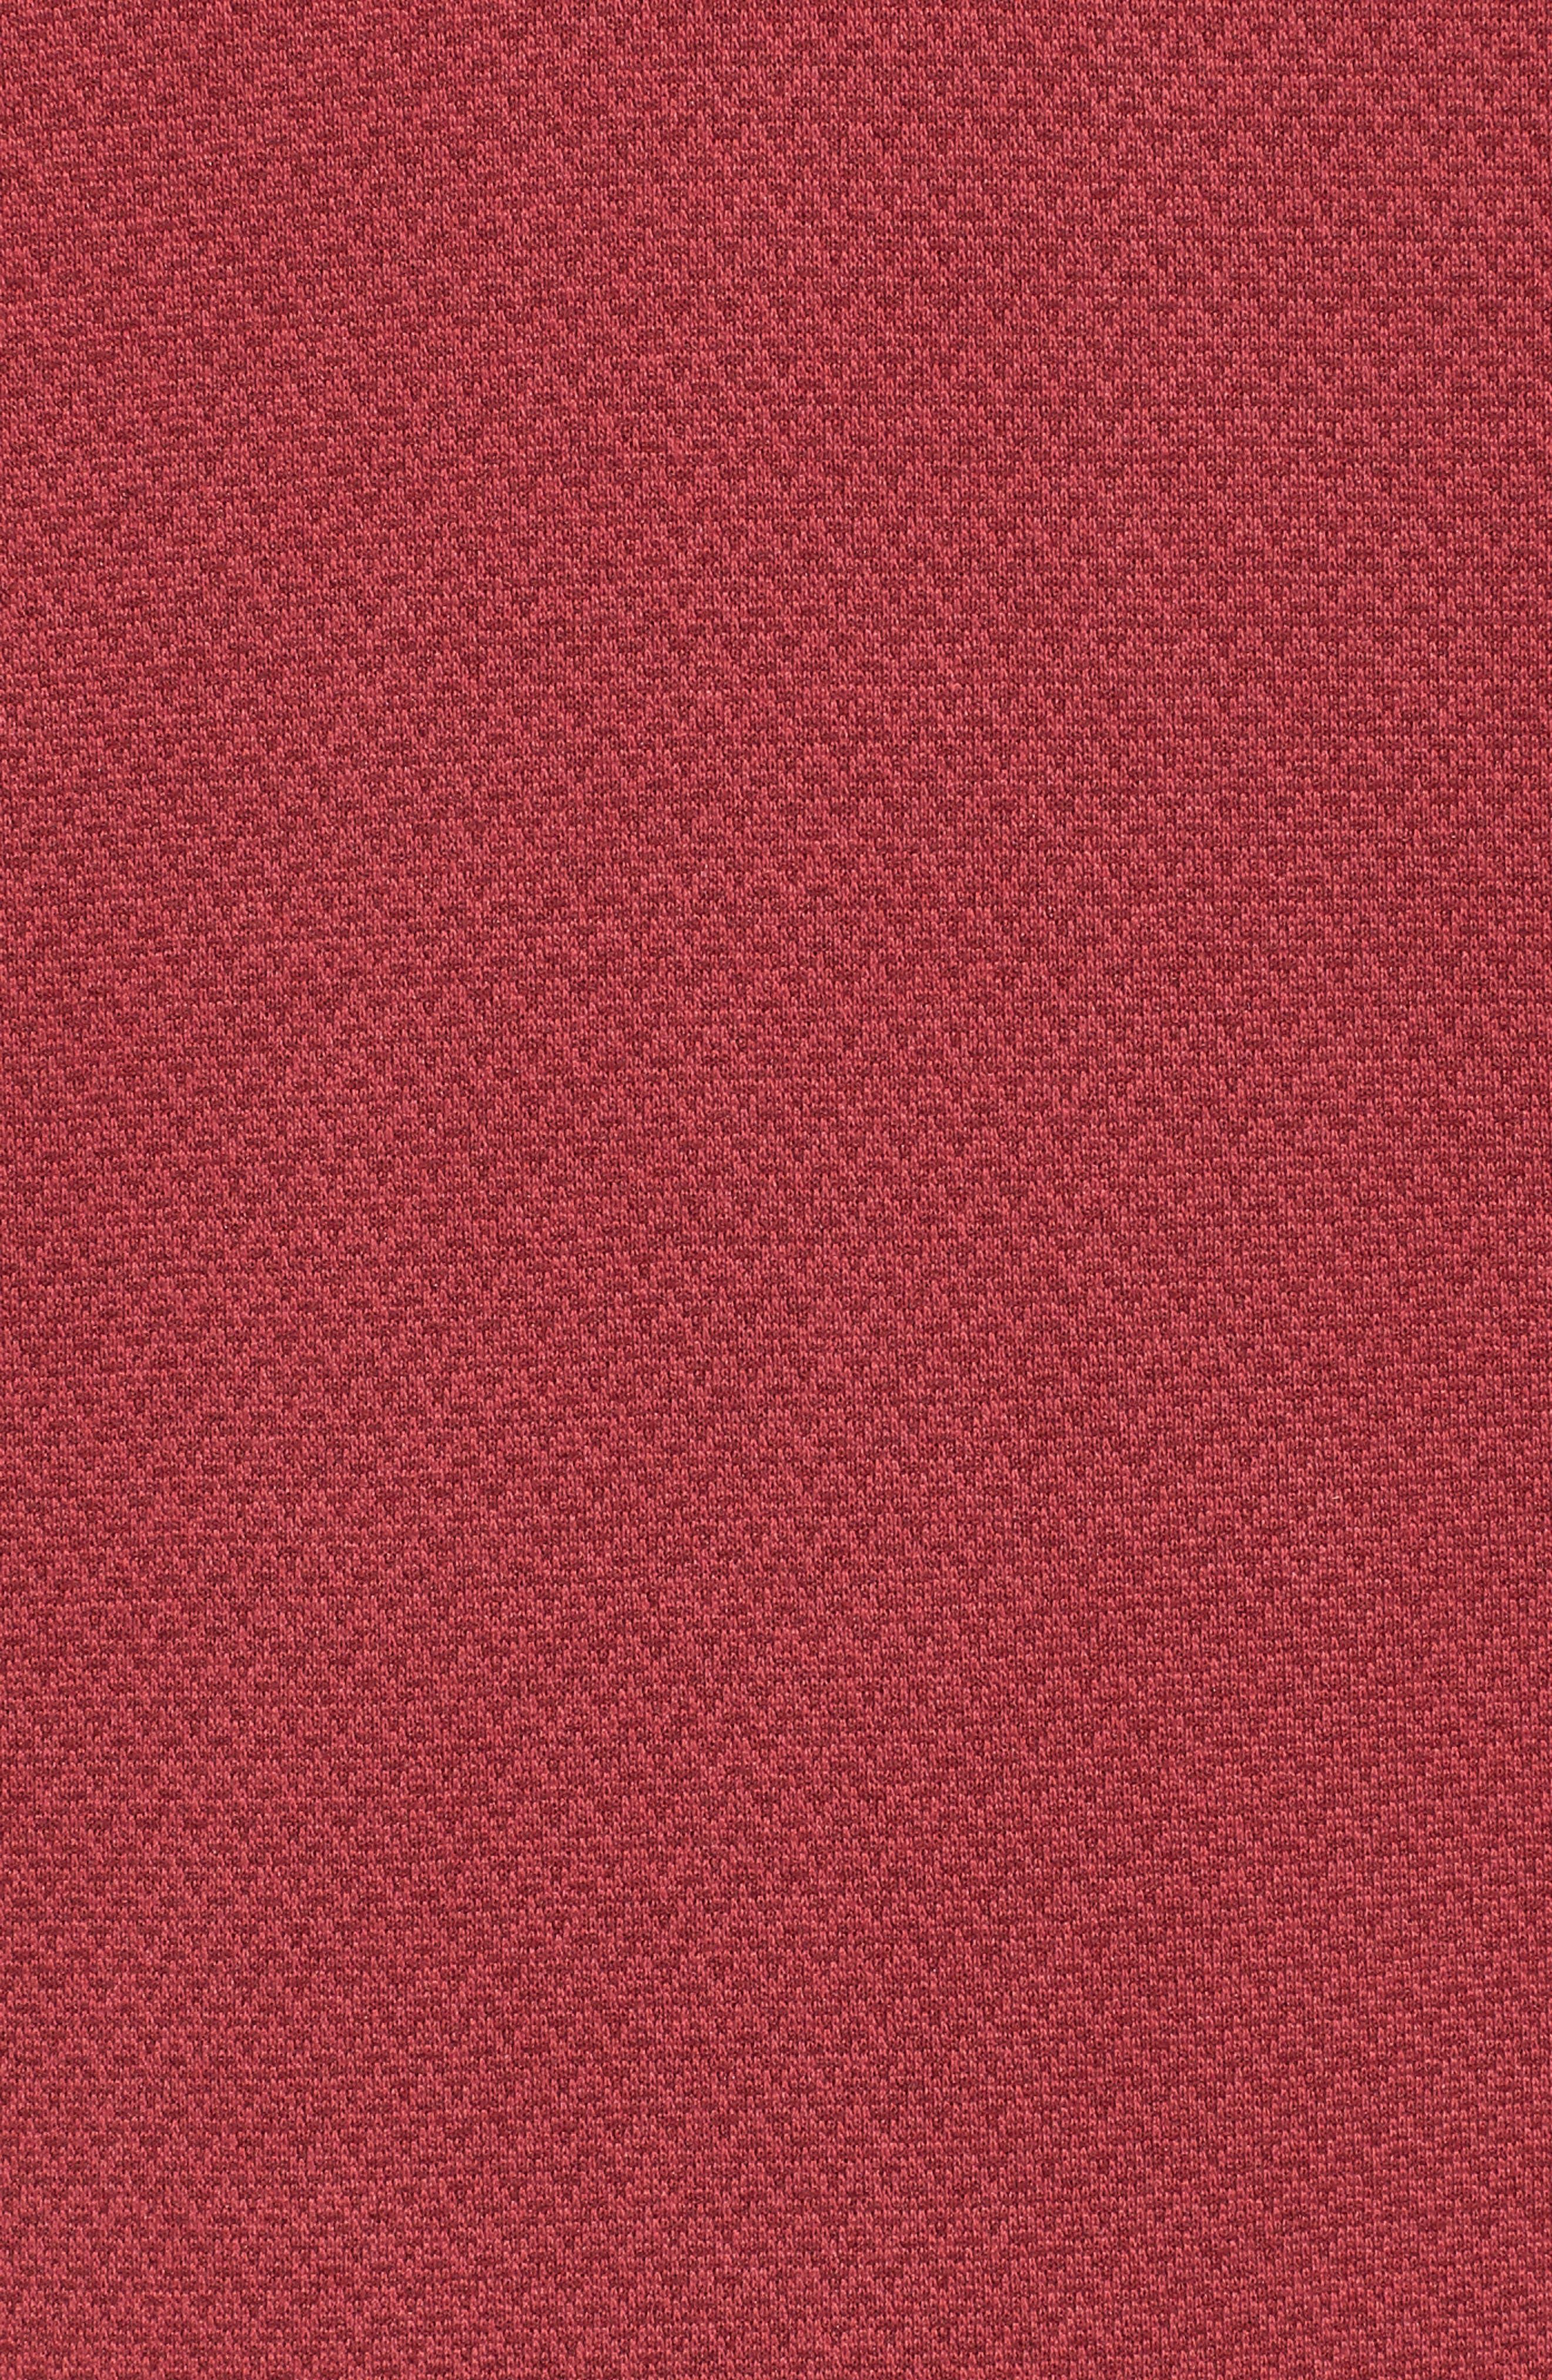 TommyBahama'Little ZigZag' Short SleevePolo,                             Alternate thumbnail 5, color,                             Sangria Red